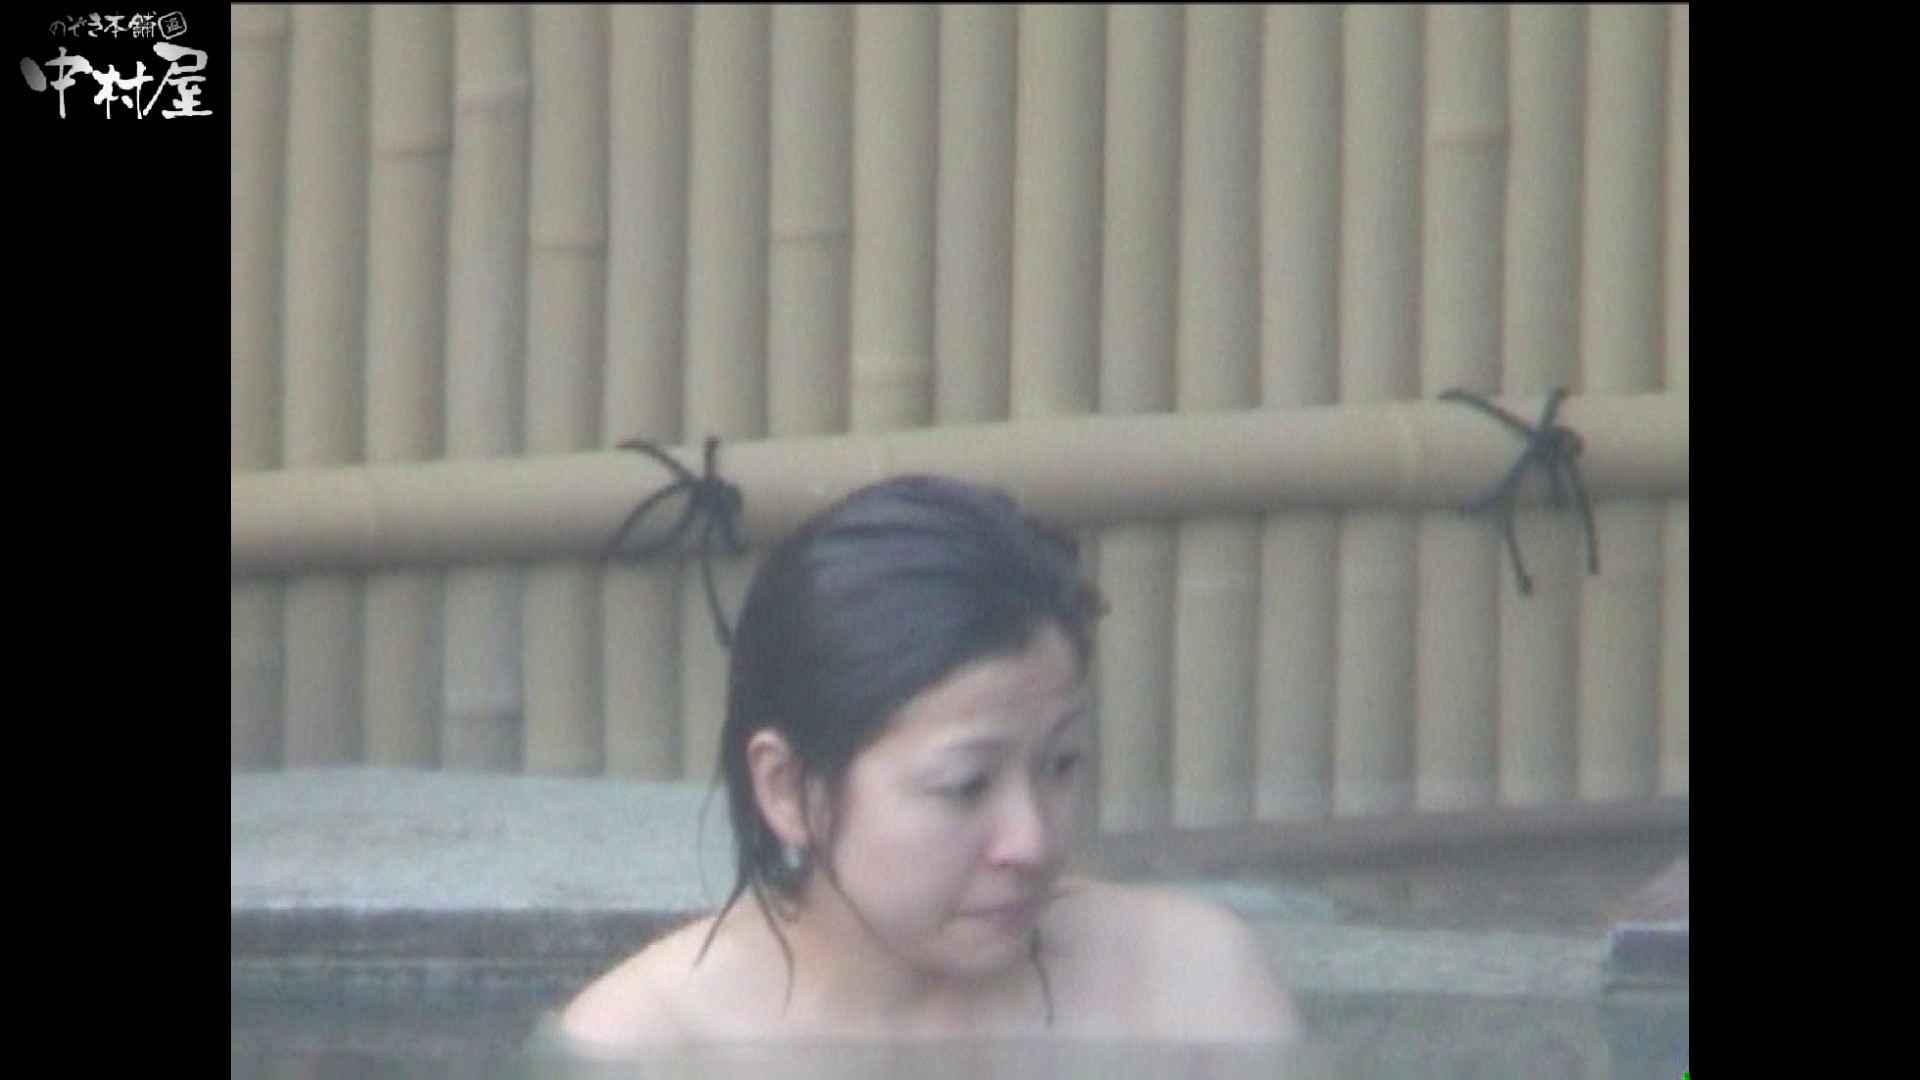 Aquaな露天風呂Vol.986 露天 | OLのプライベート  13pic 7